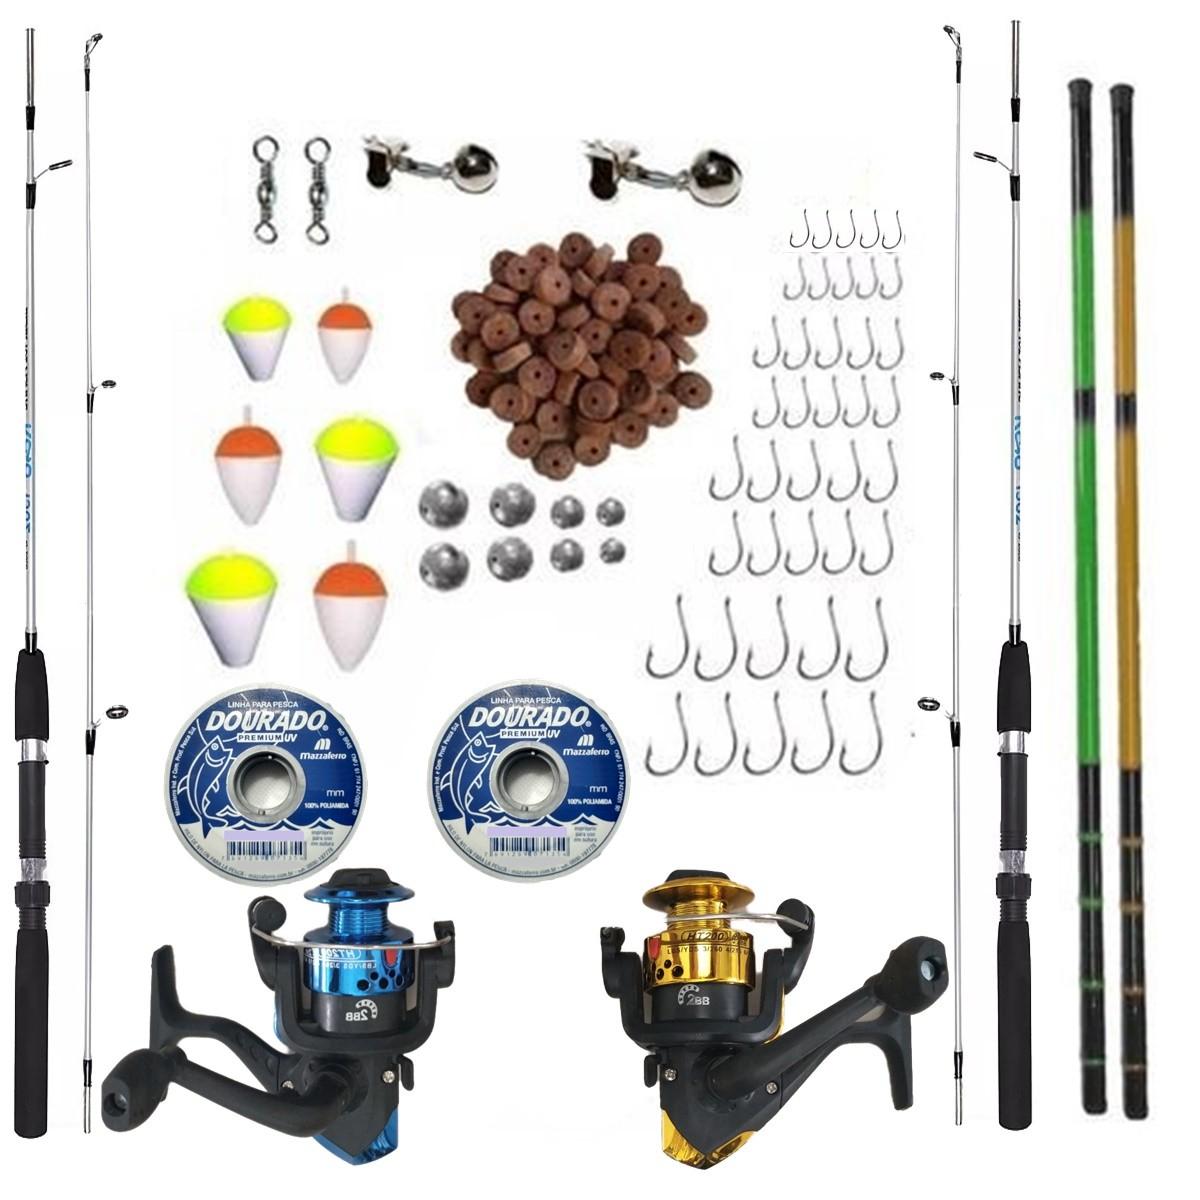 Kit Pesca Completo 6kg 2 Vara 2 Molinete 2 Telescopica +item